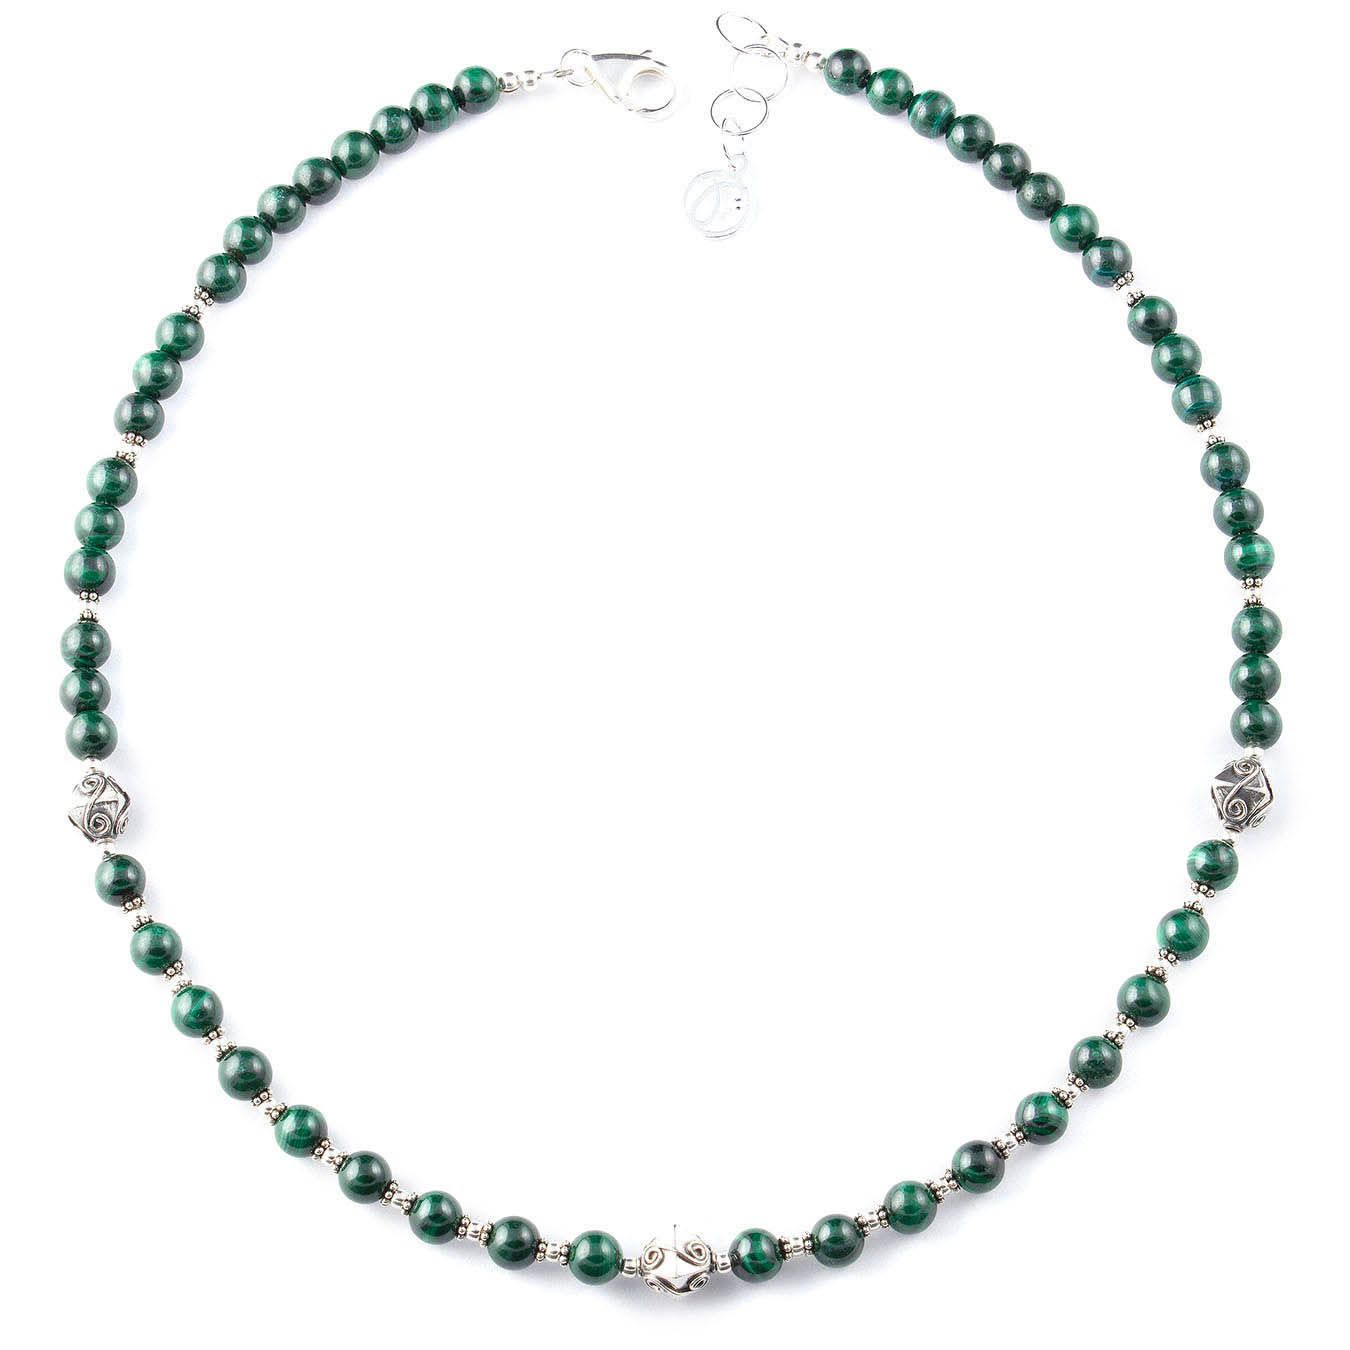 Beaded jewelry semi-precious necklace made with malachite stones